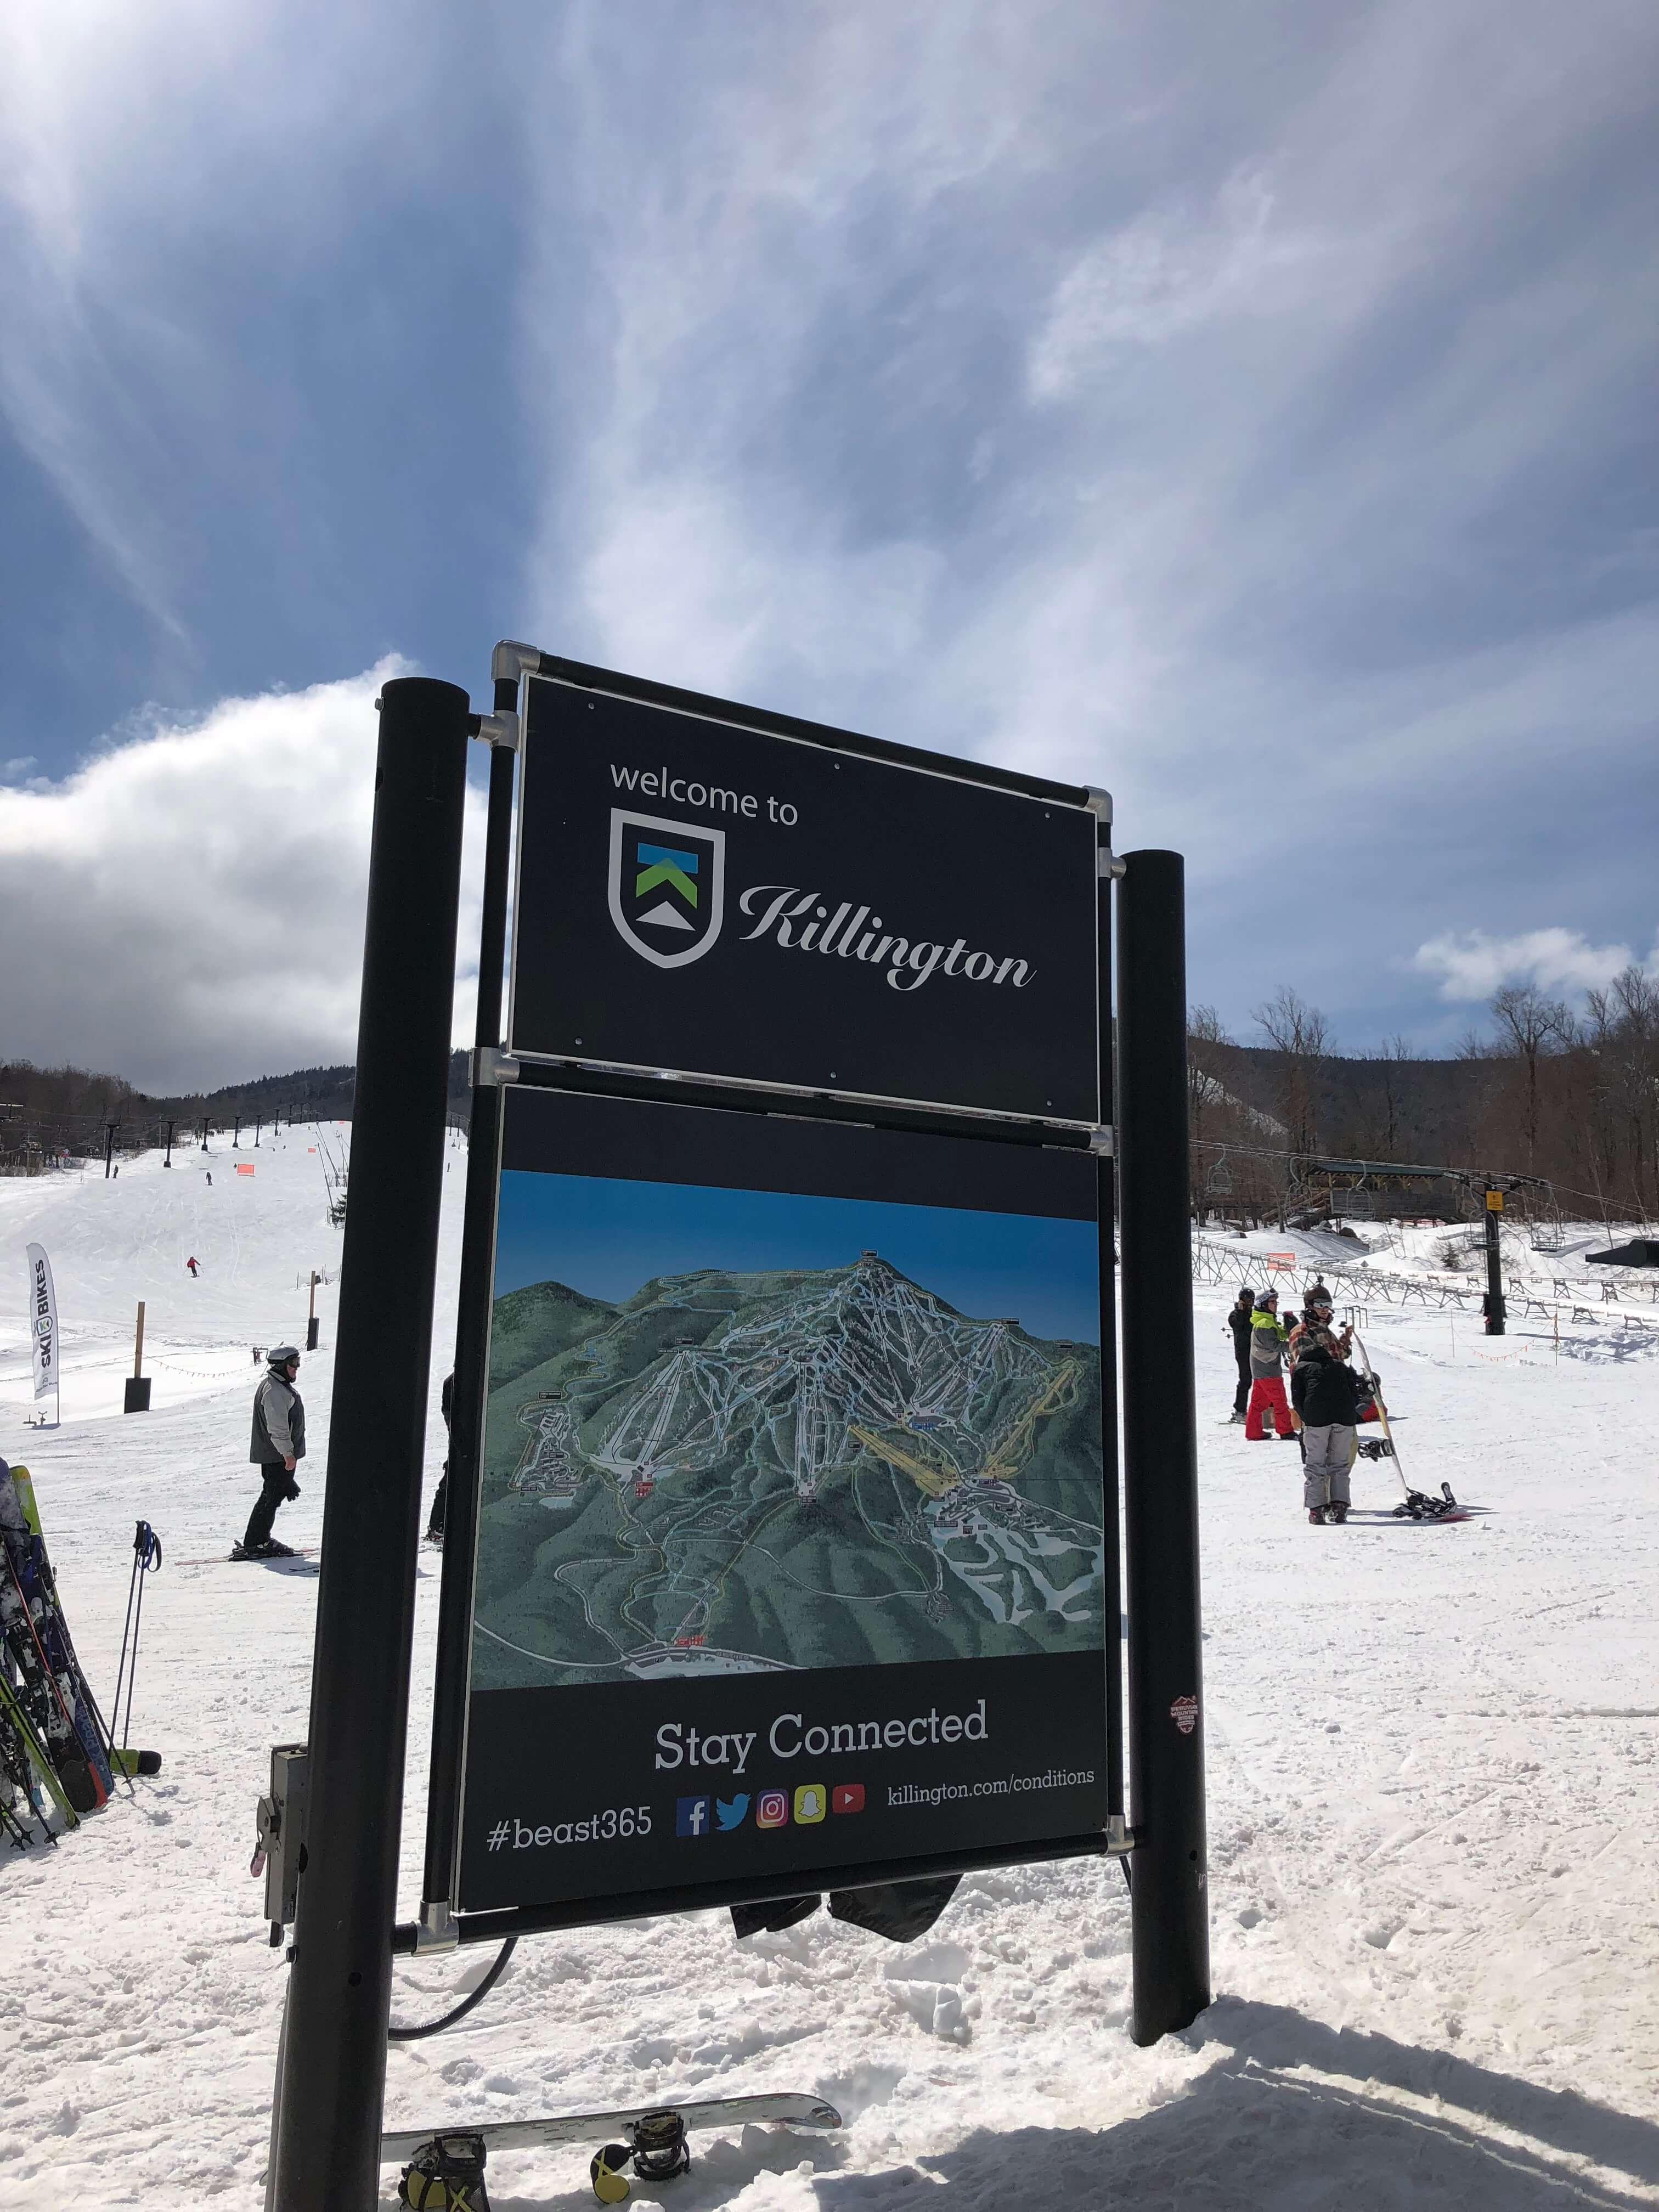 Killington Resort learning to ski